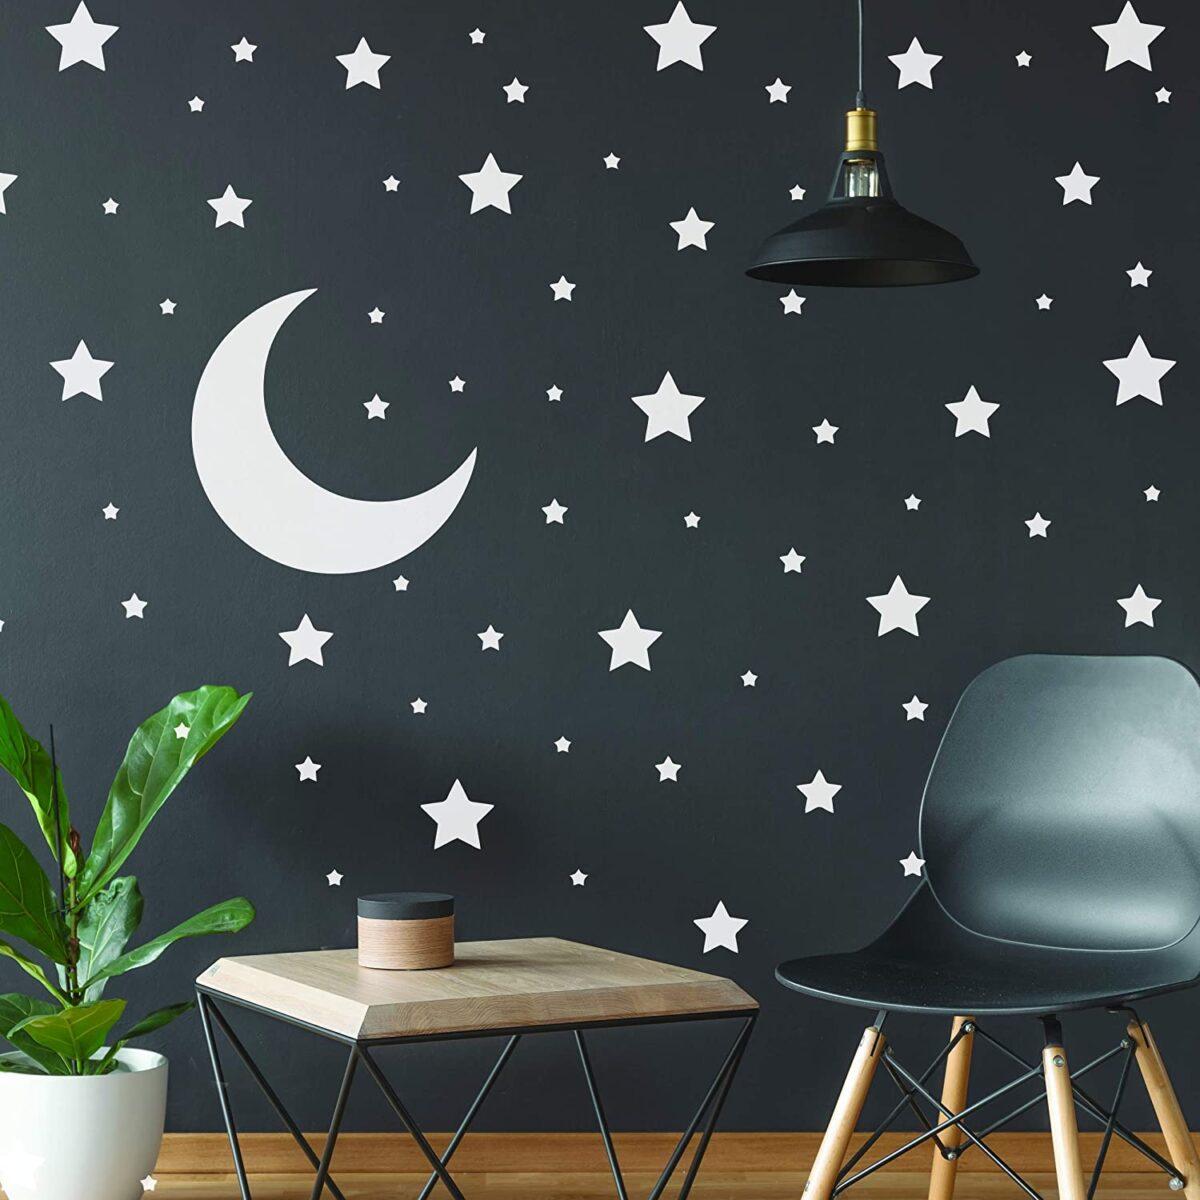 dipingere-pareti-in-modo-creativo-09